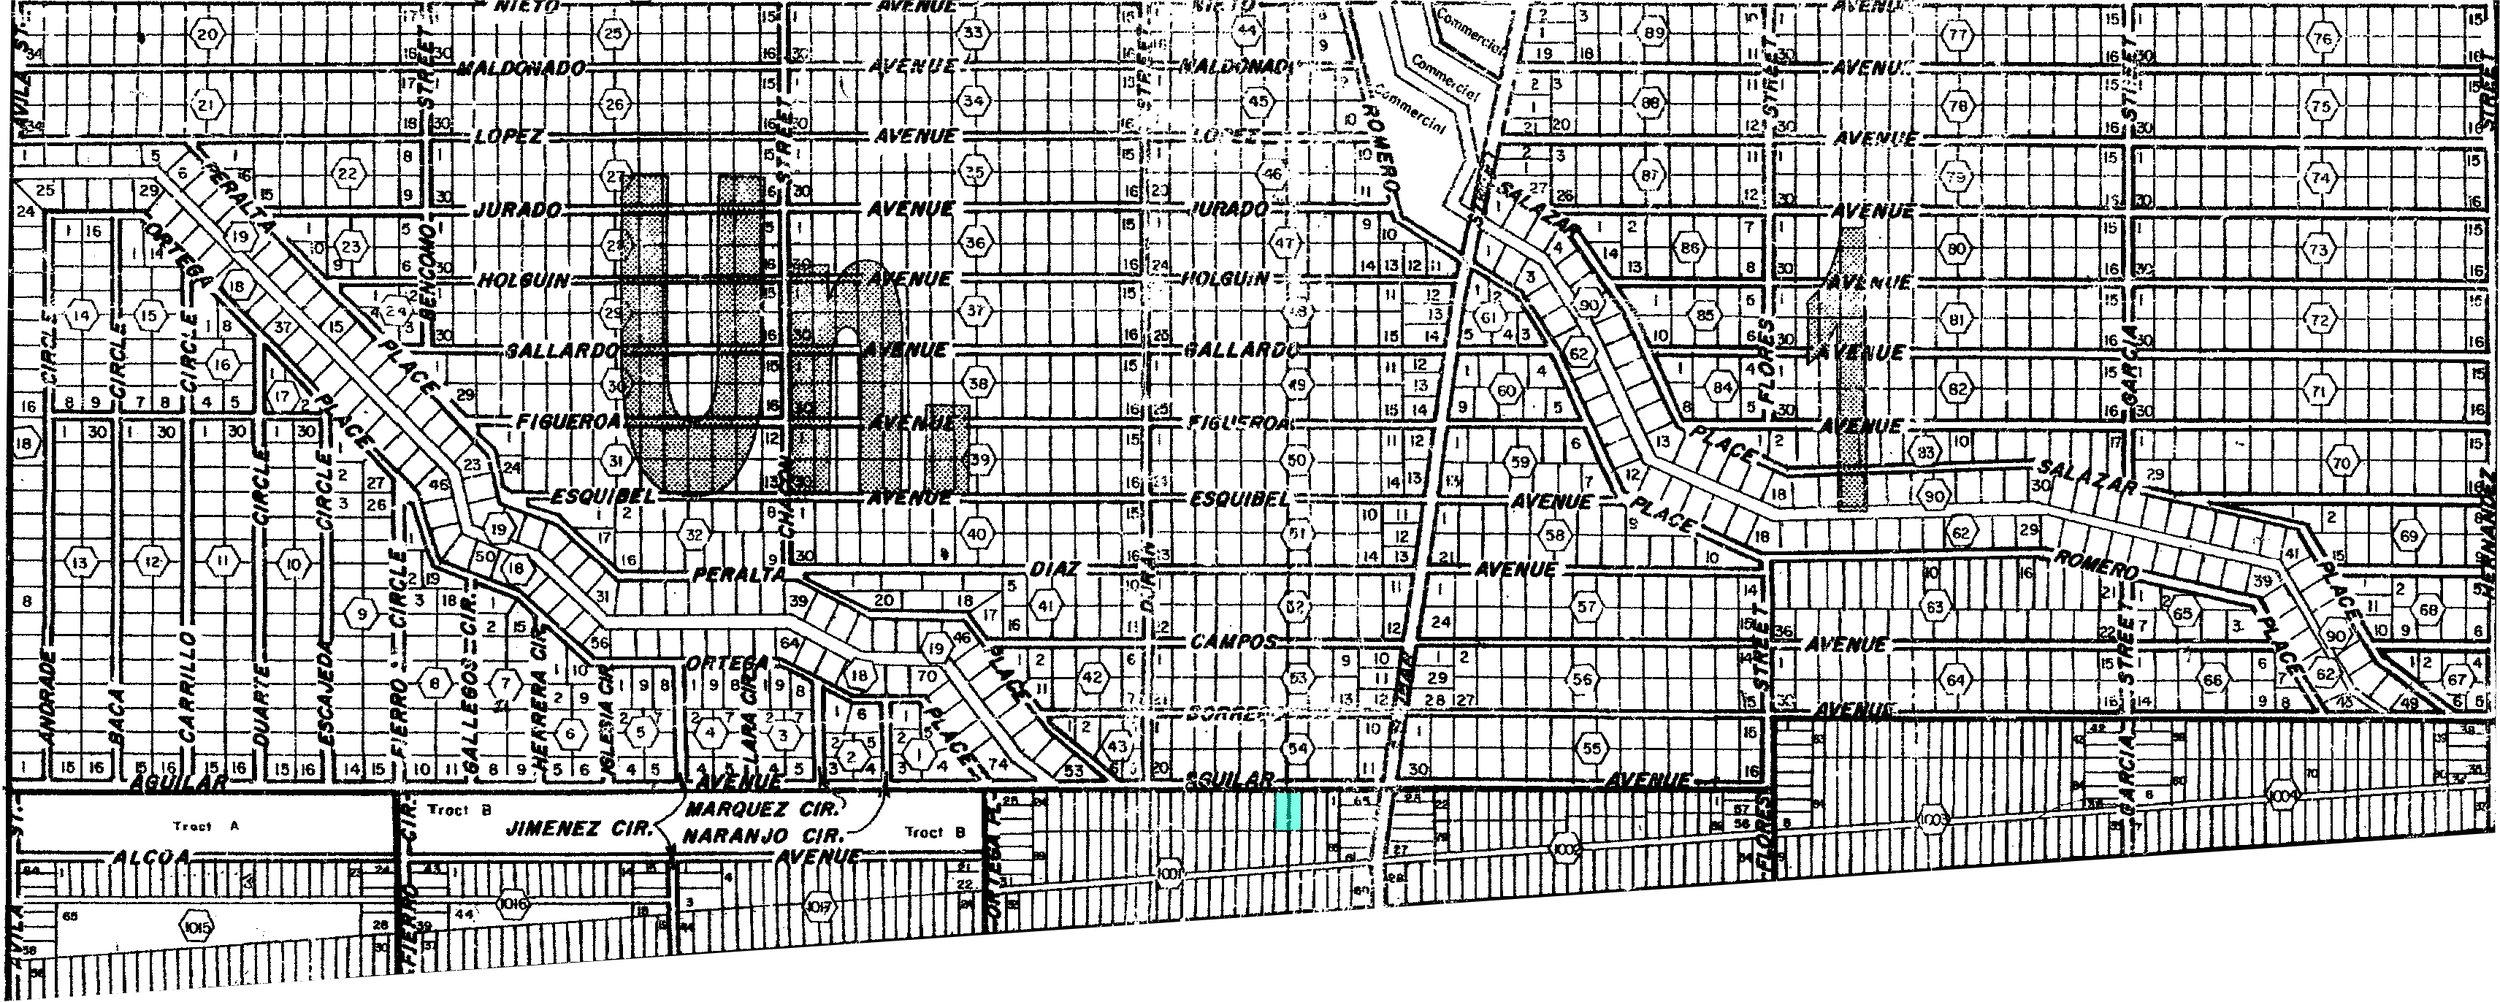 SCNM-0010, plat map.jpg